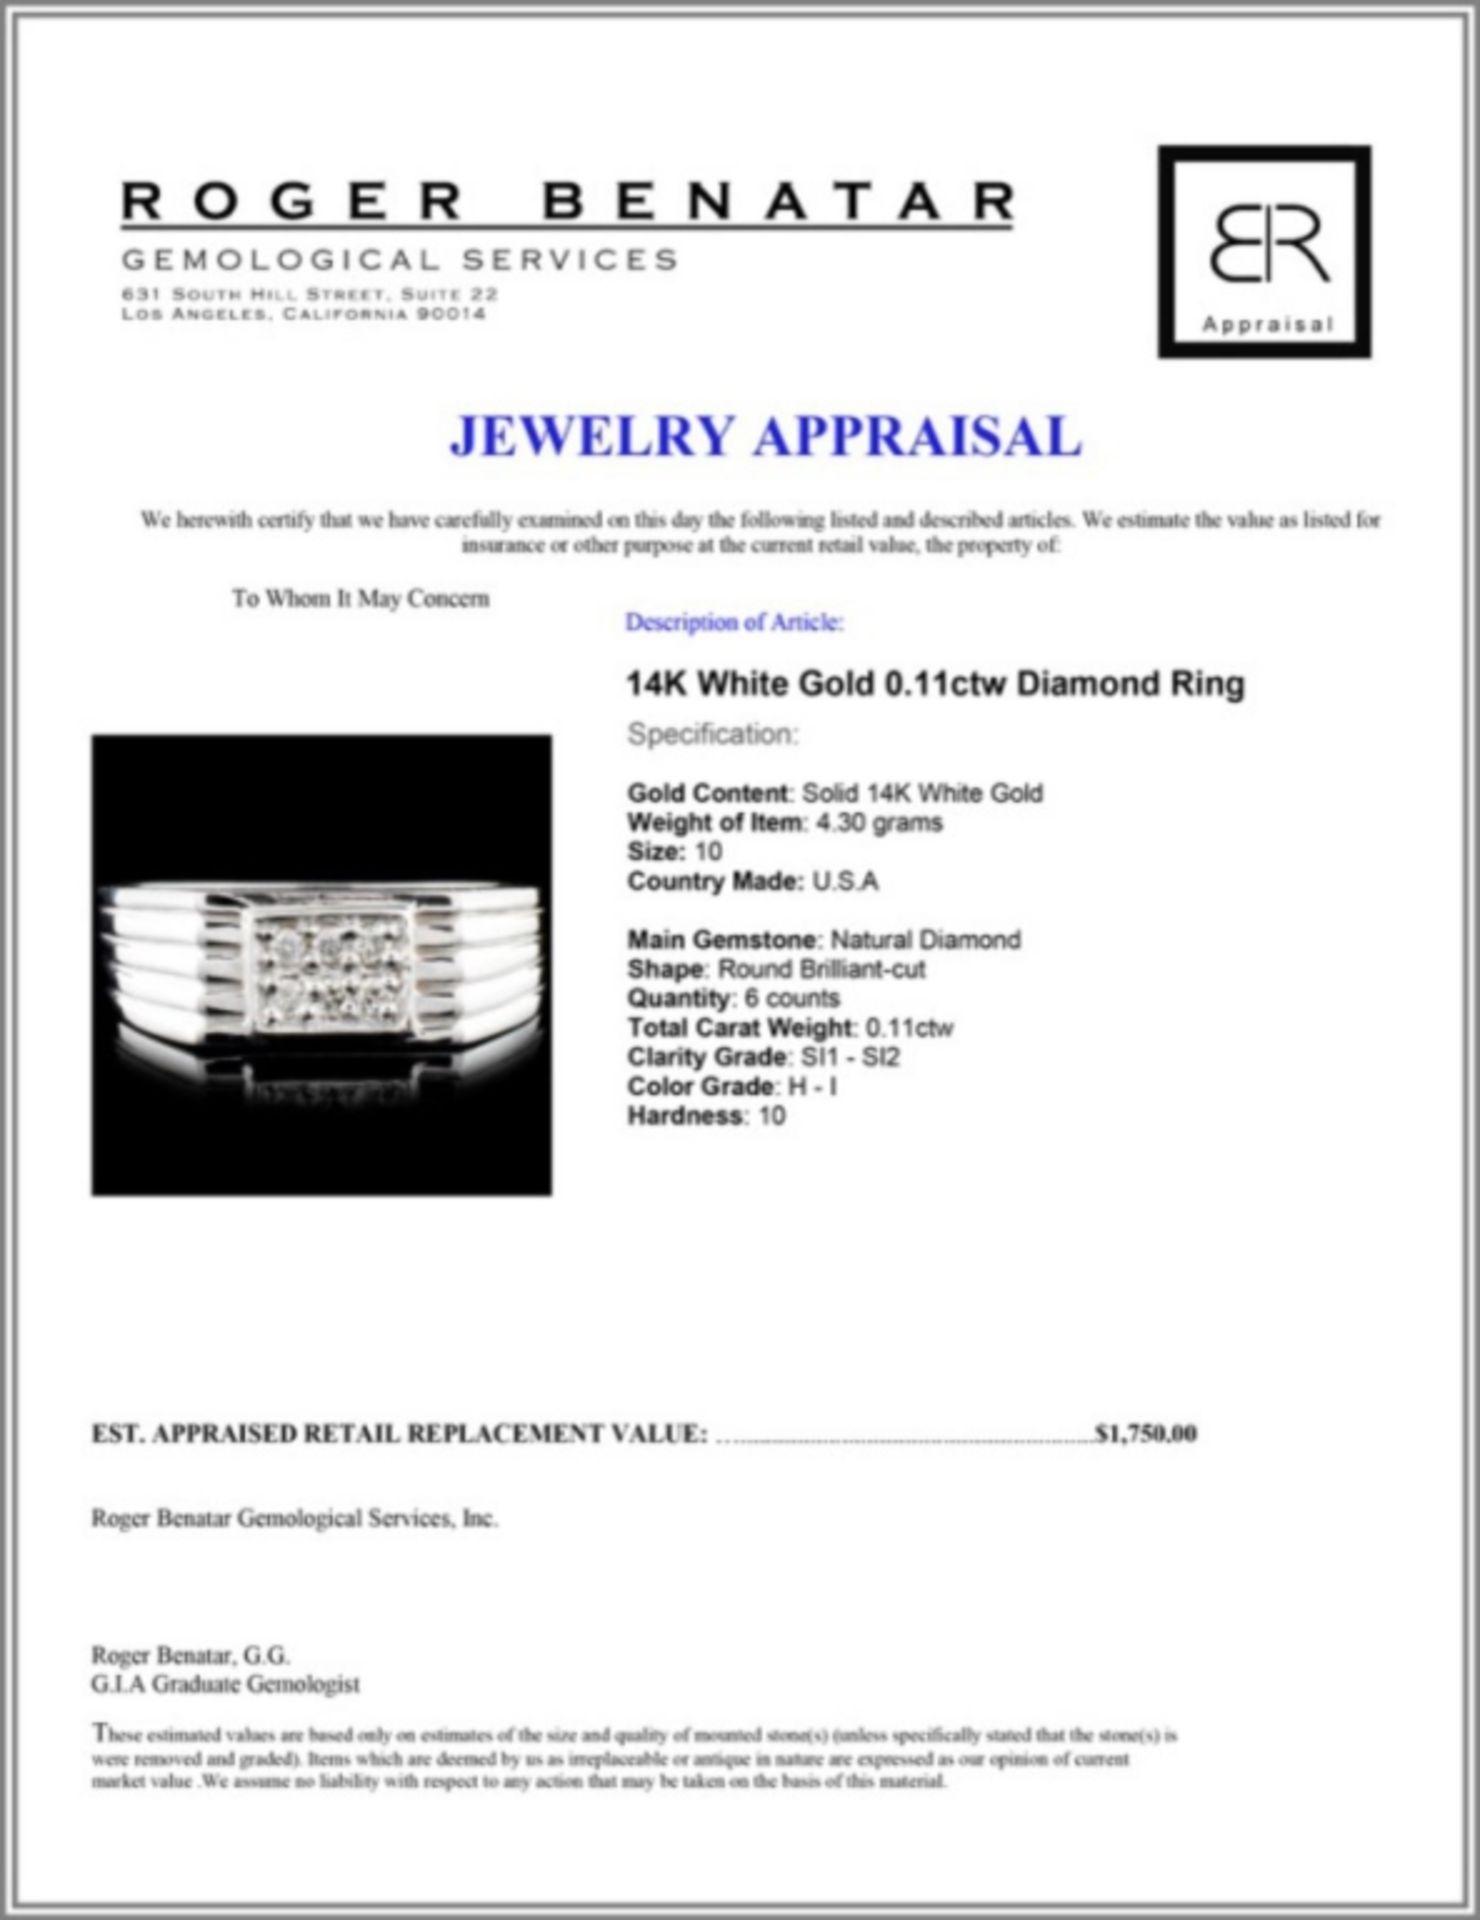 14K Gold 0.11ctw Diamond Ring - Image 3 of 3